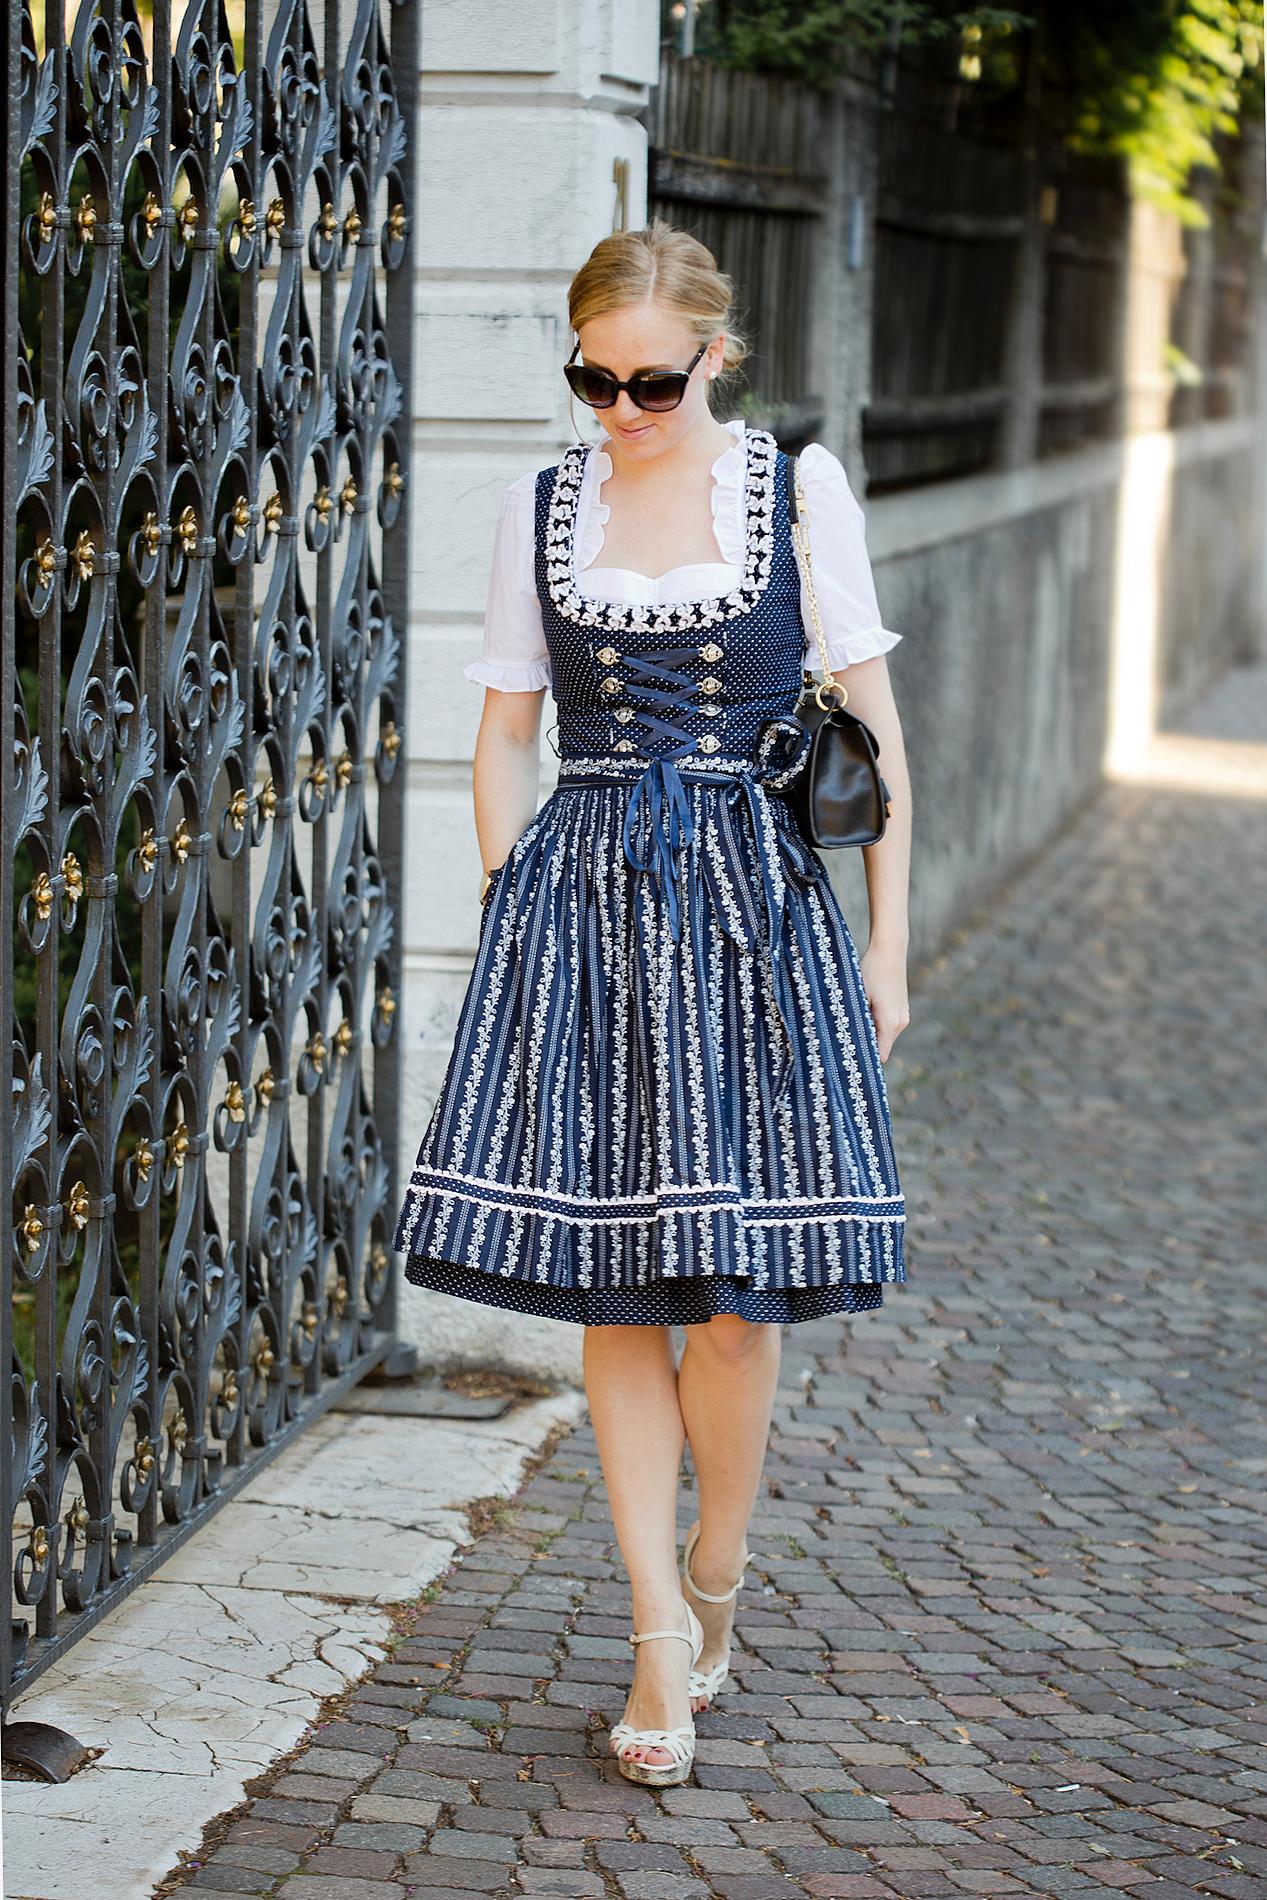 dirndl zalando _ Almsach Lola Dirndl _ dirndl styling2 - The Golden Bun